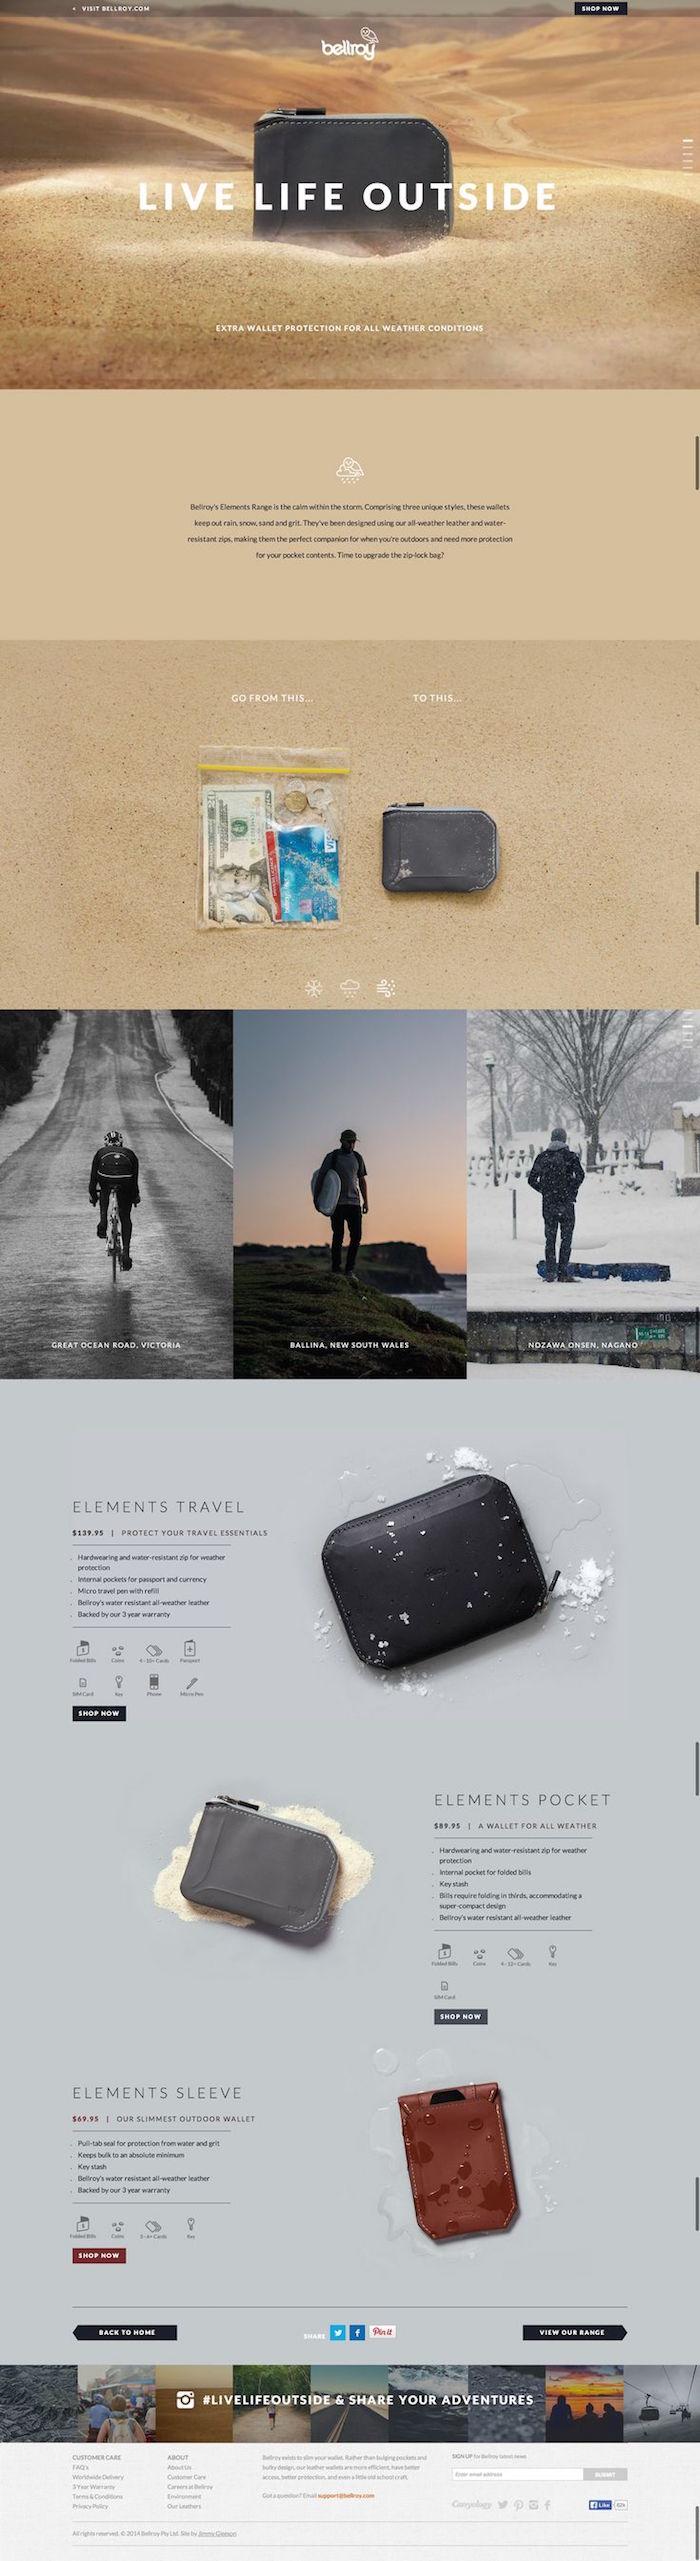 diseños web diciembre 2014 img 8